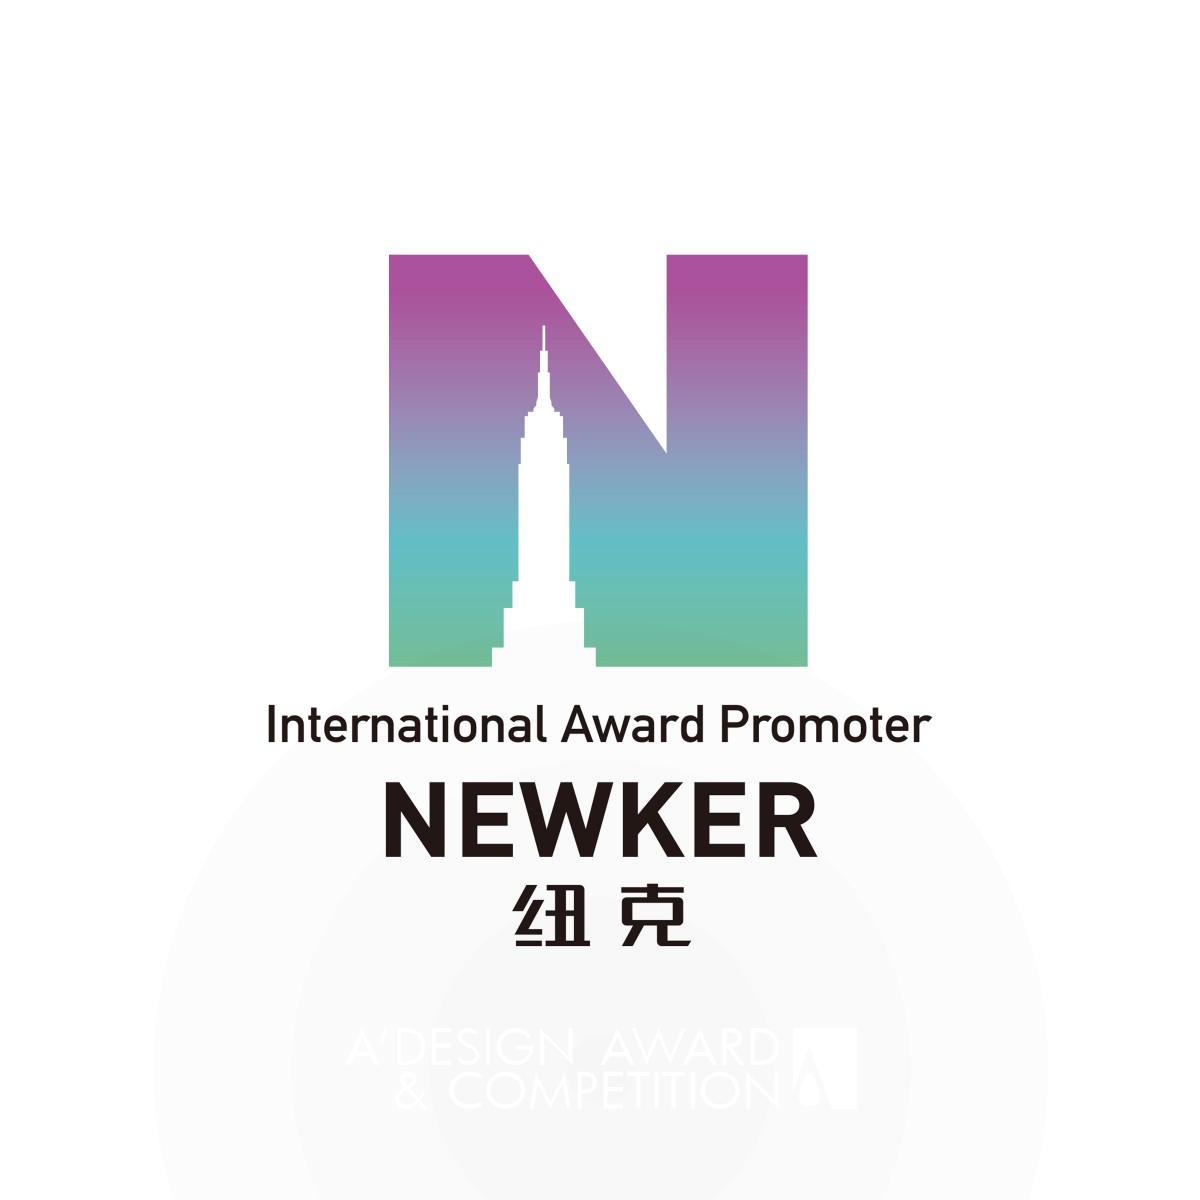 Newker Logo Brand Design